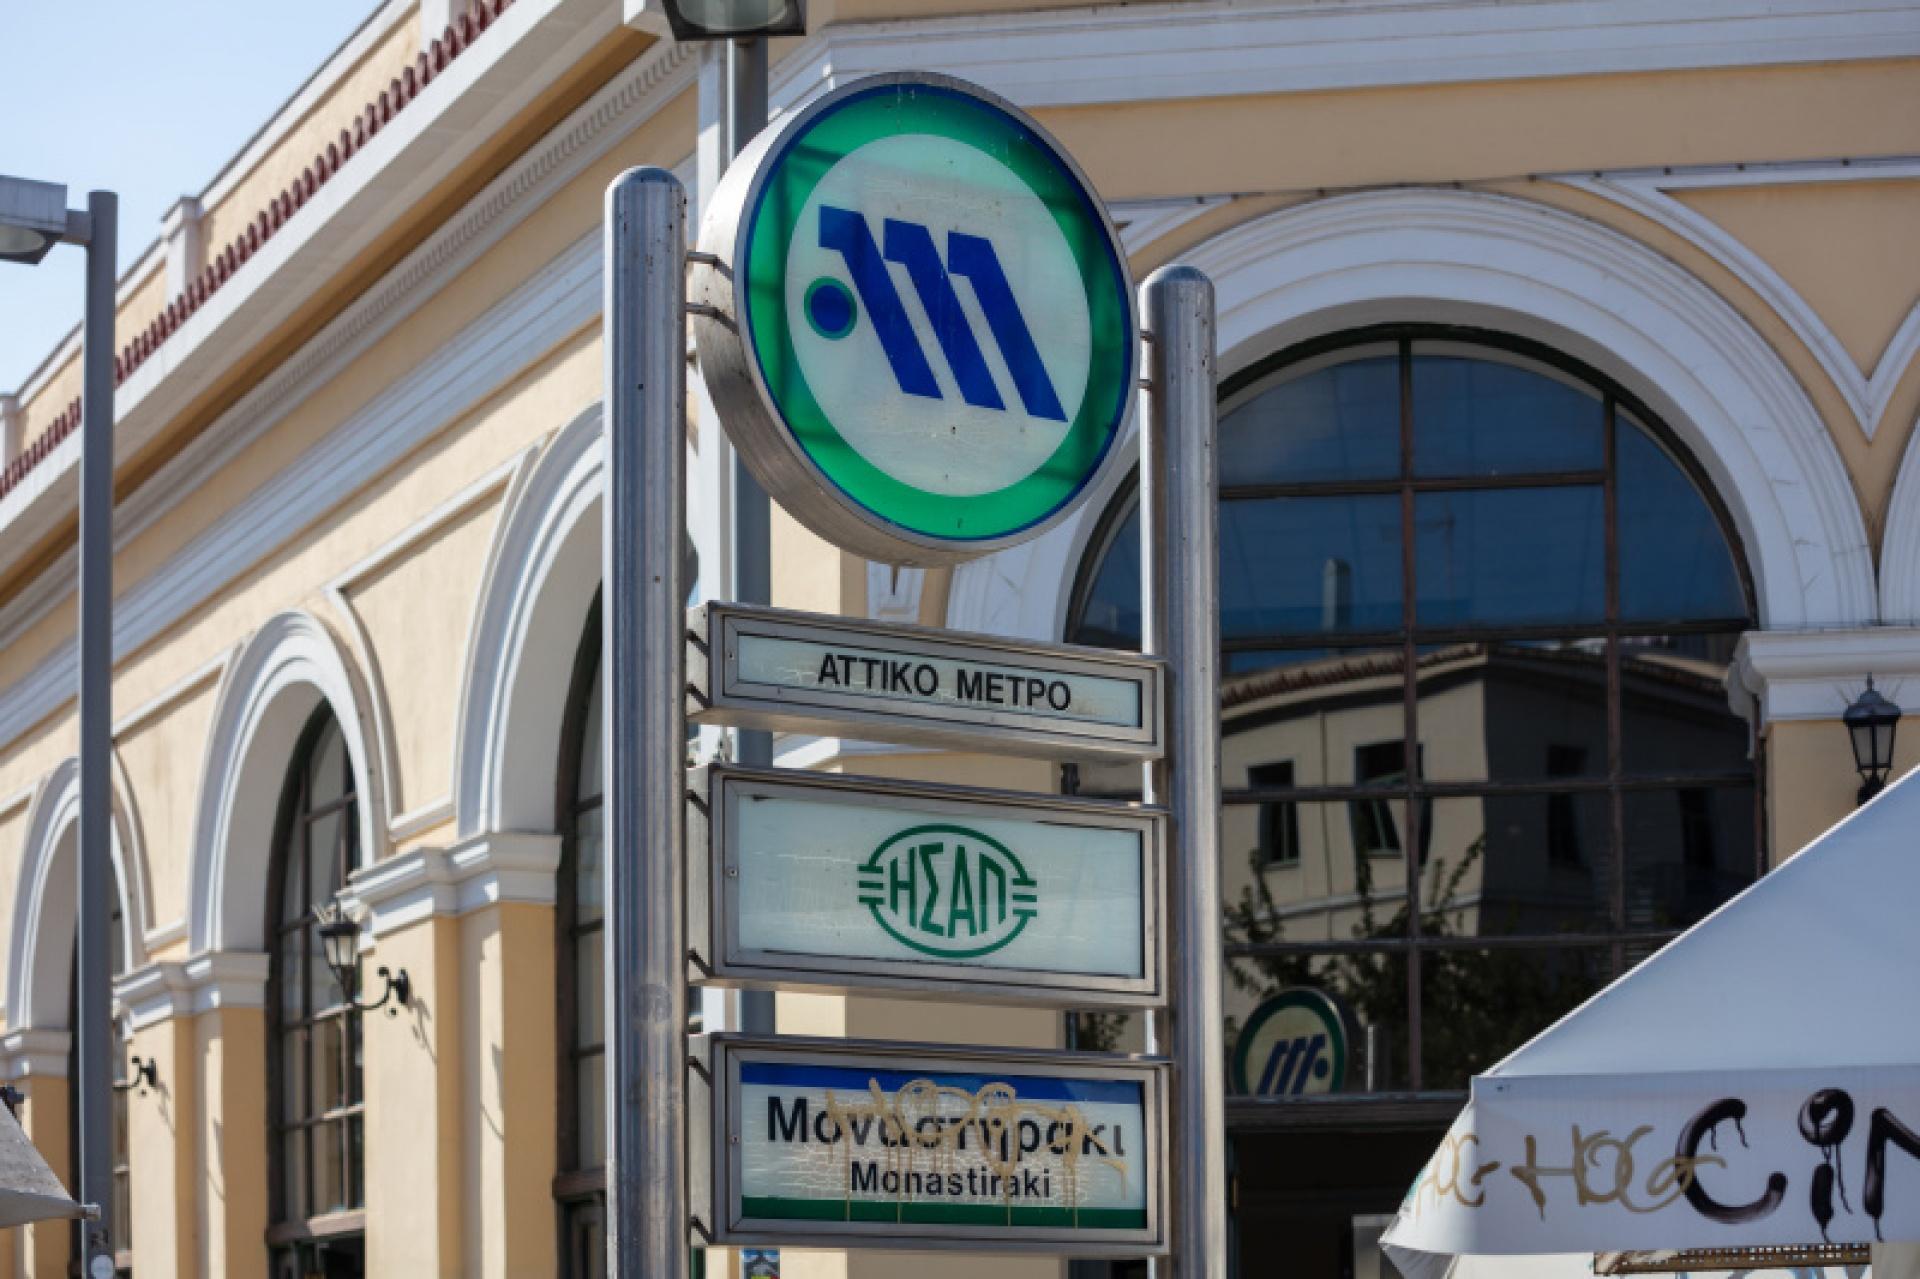 Athens public transport sign